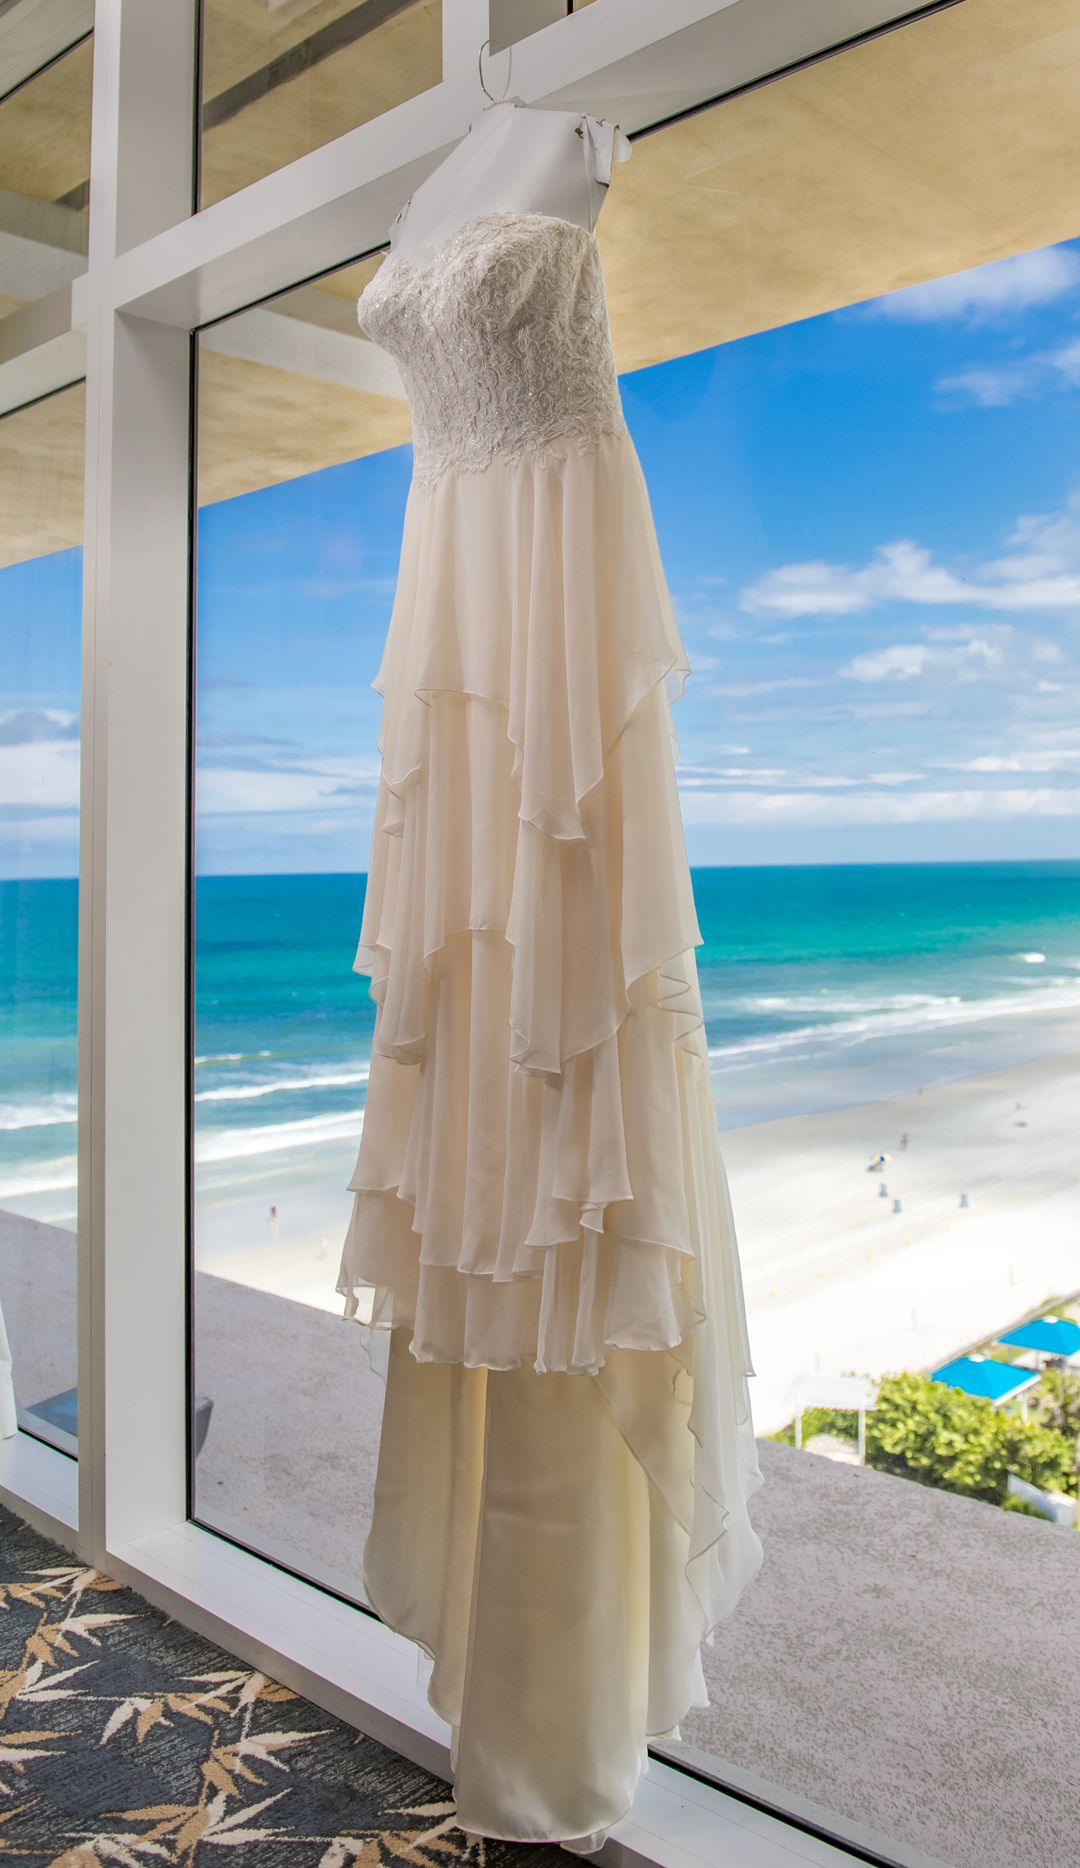 Kristinaneil weddingshores resort daytona beach shores fl us